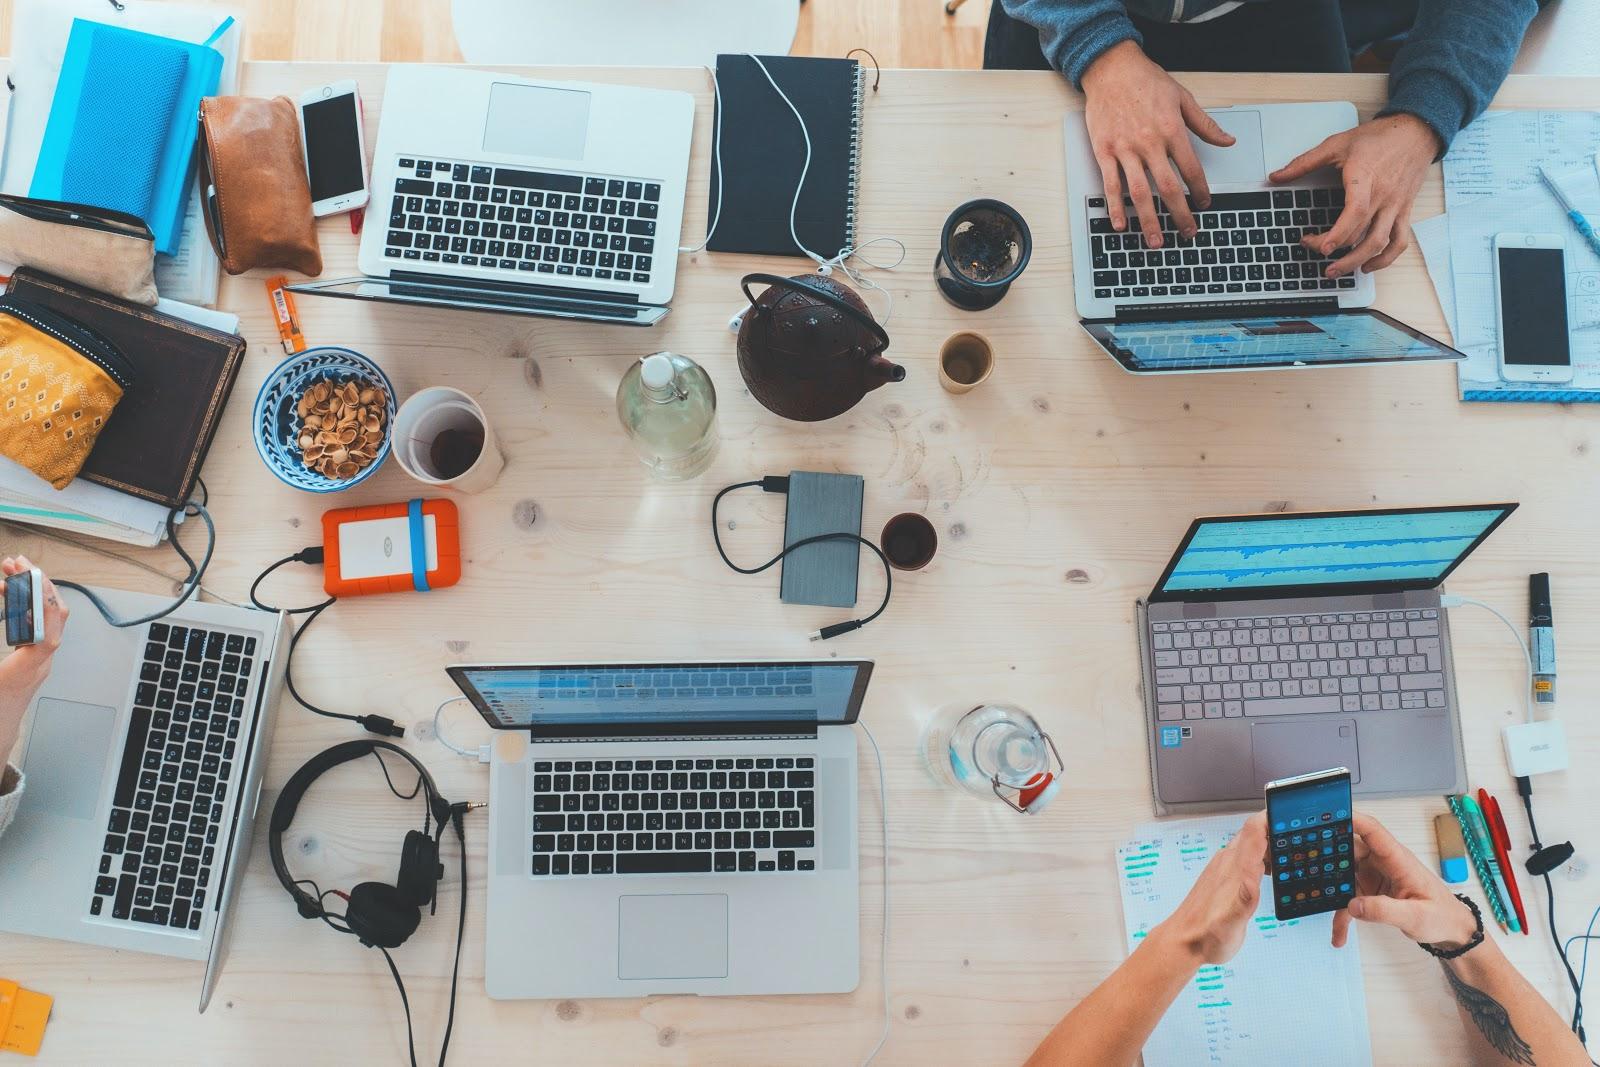 It technicians, laptops on table, taking notes